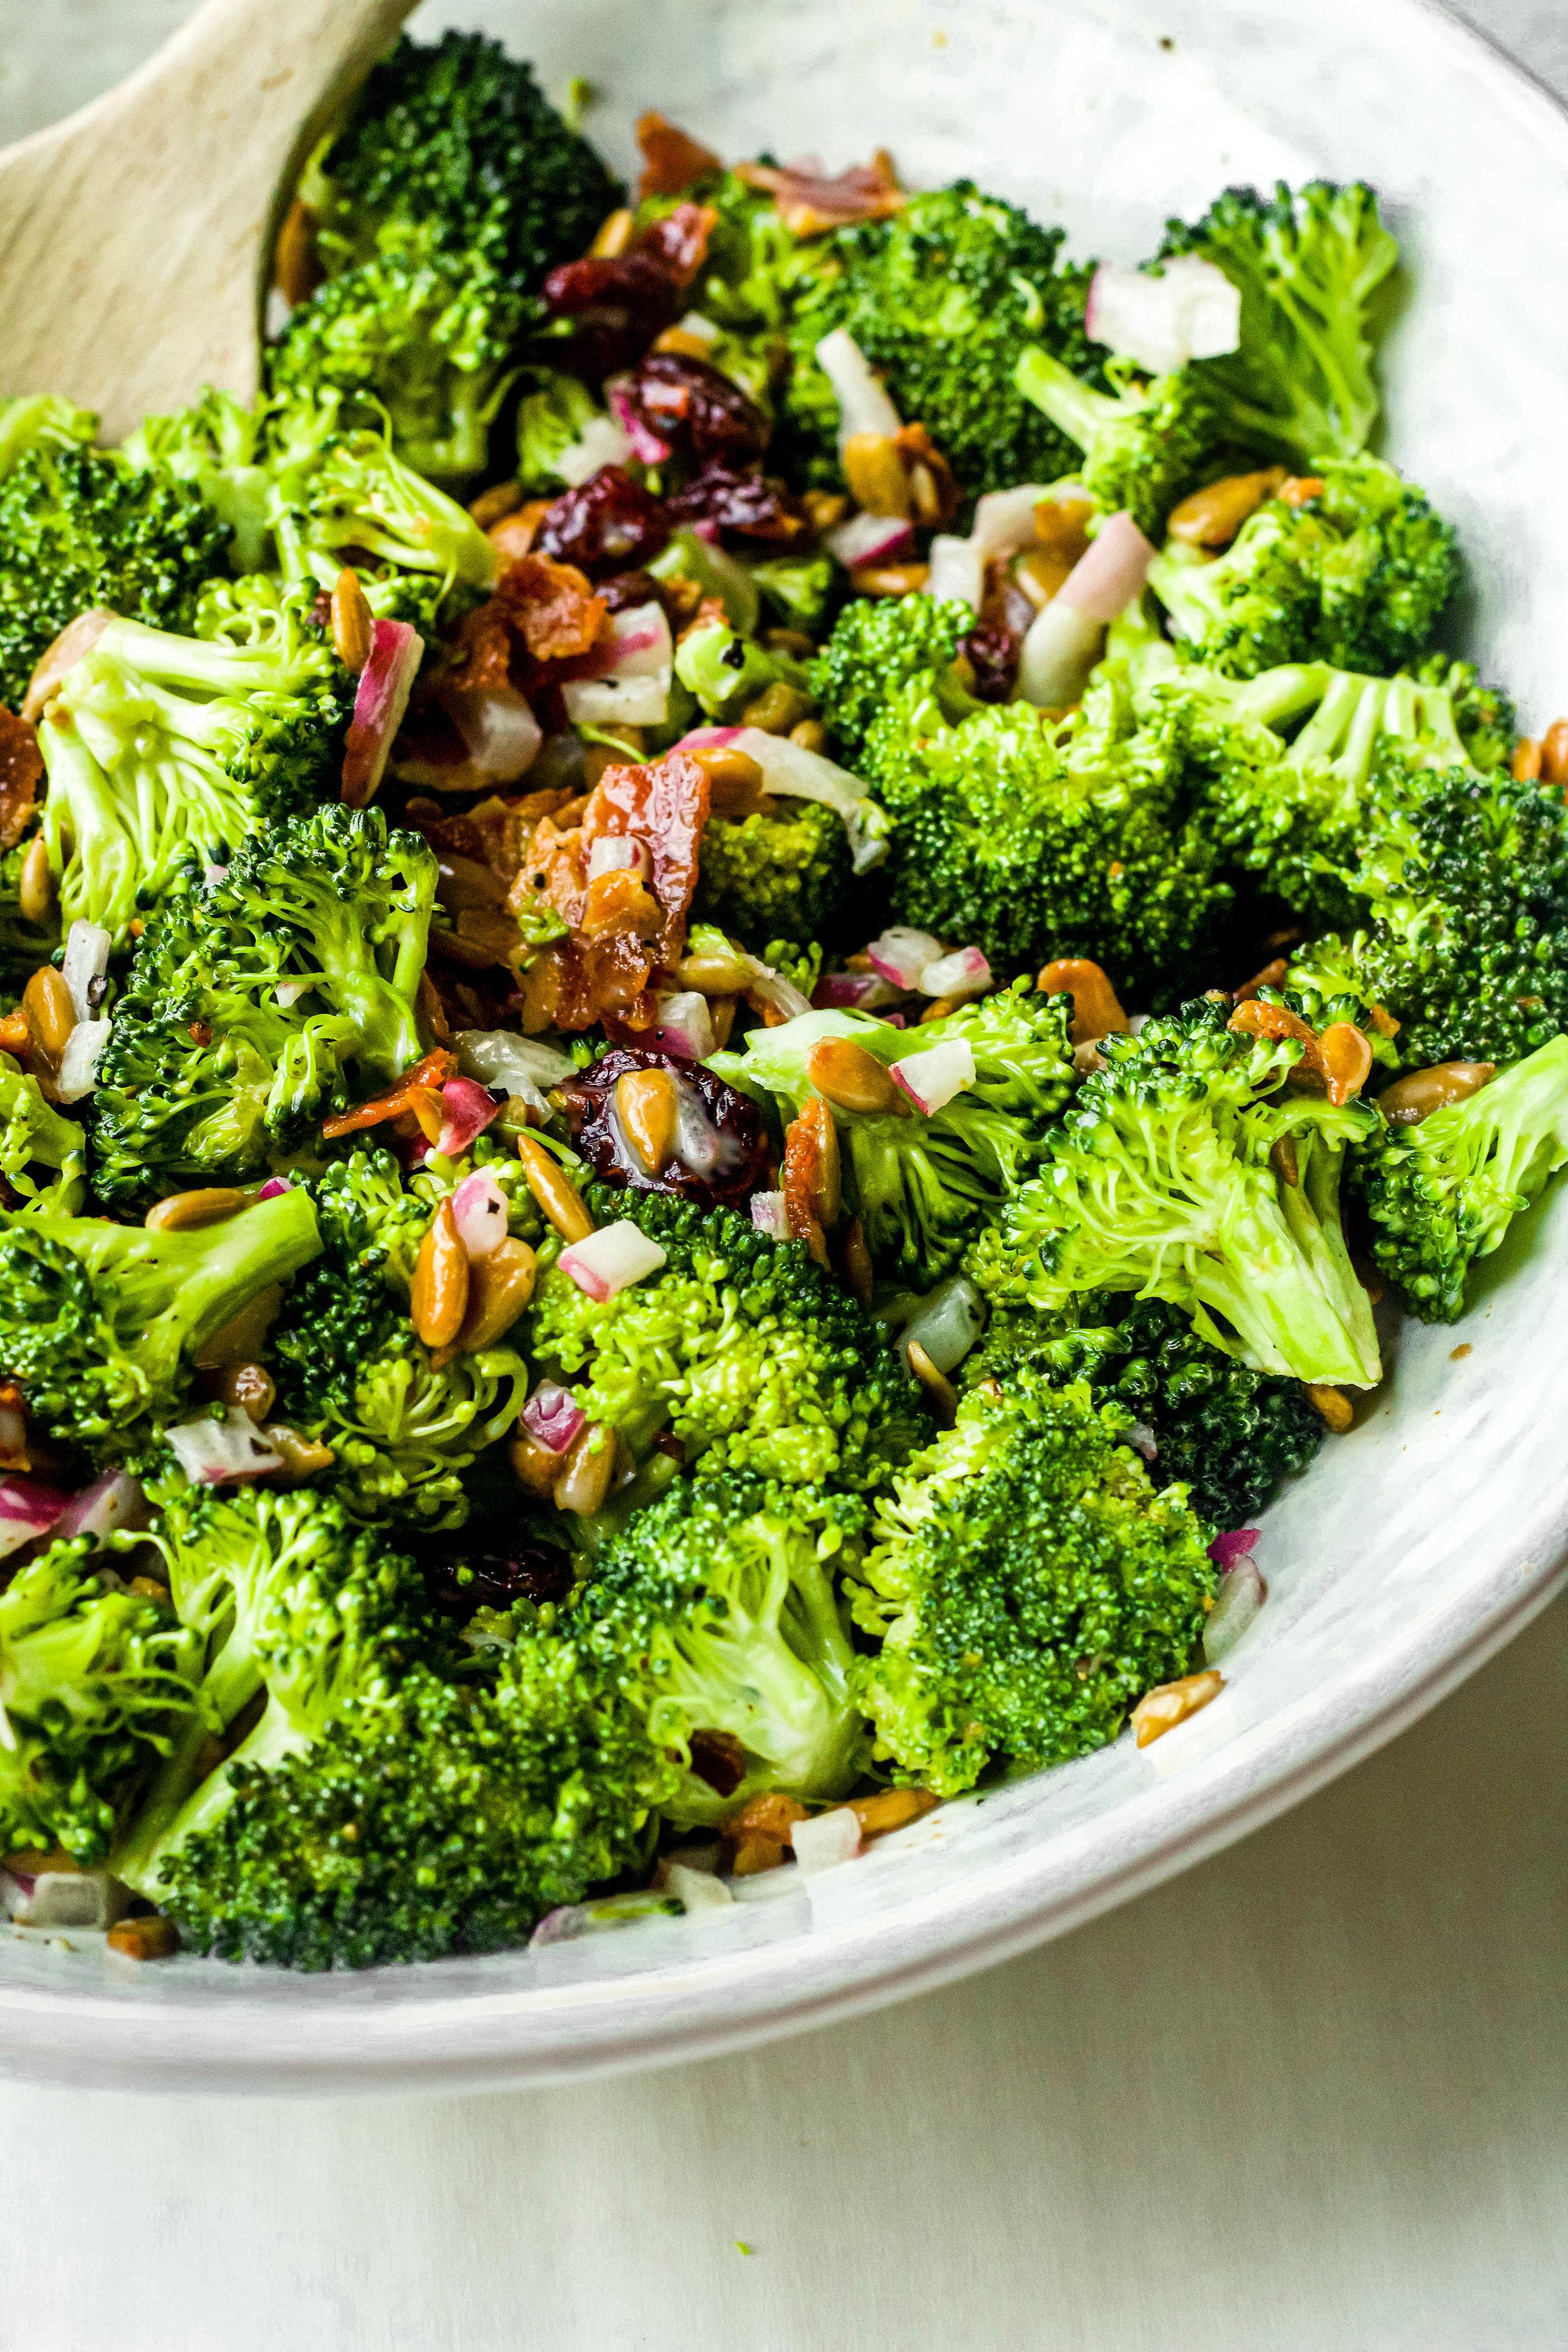 Broccoli Salad (Paleo, Dairy-Free, Gluten Free)